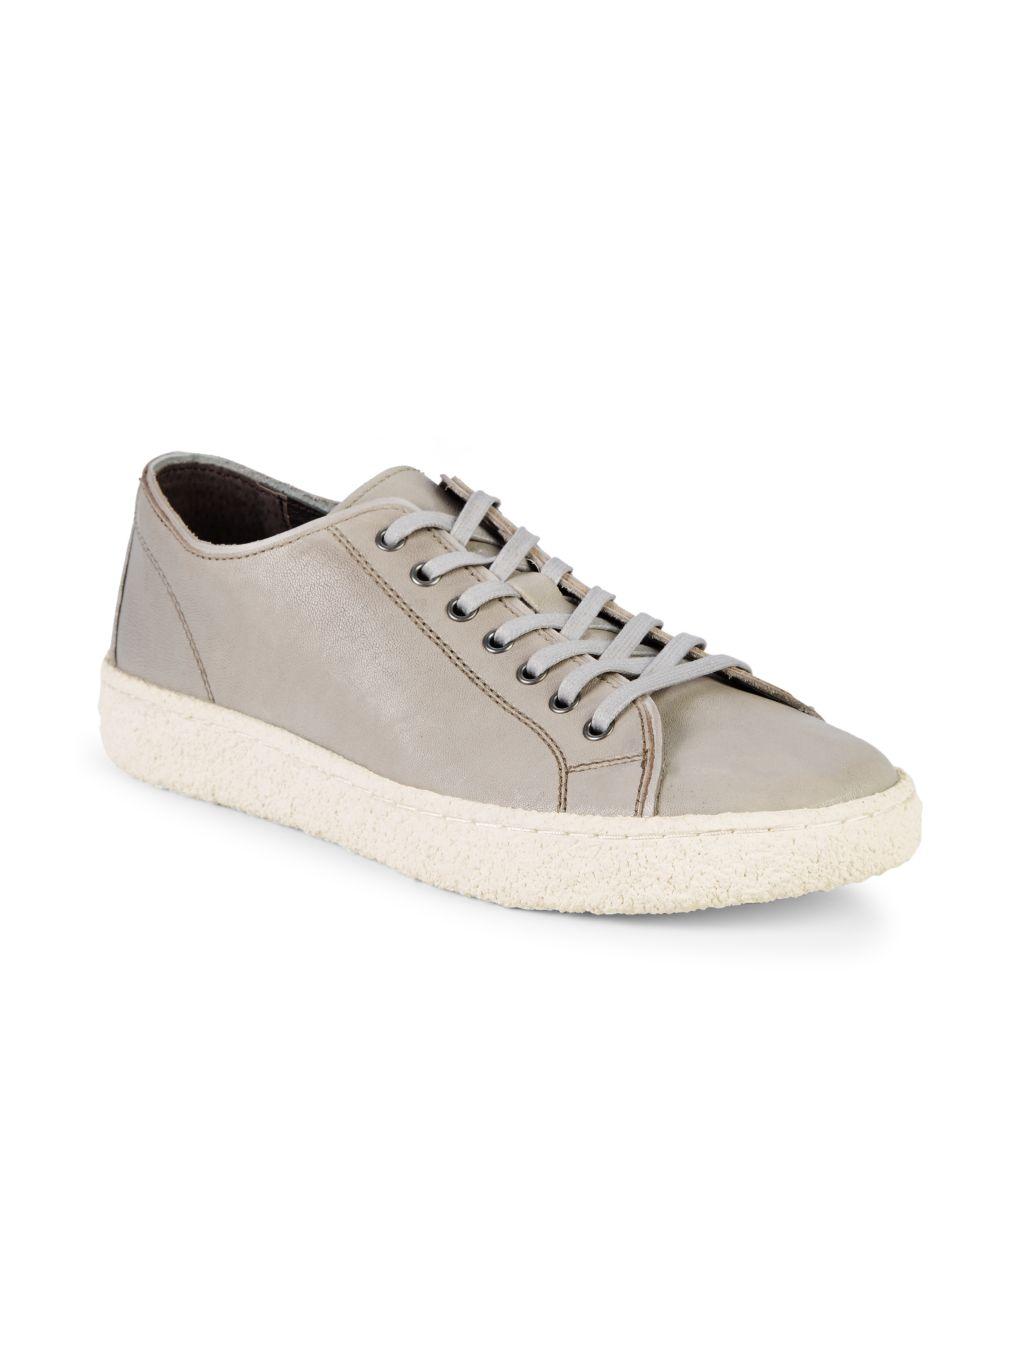 John Varvatos Star U.S.A. Star Leather Sneakers